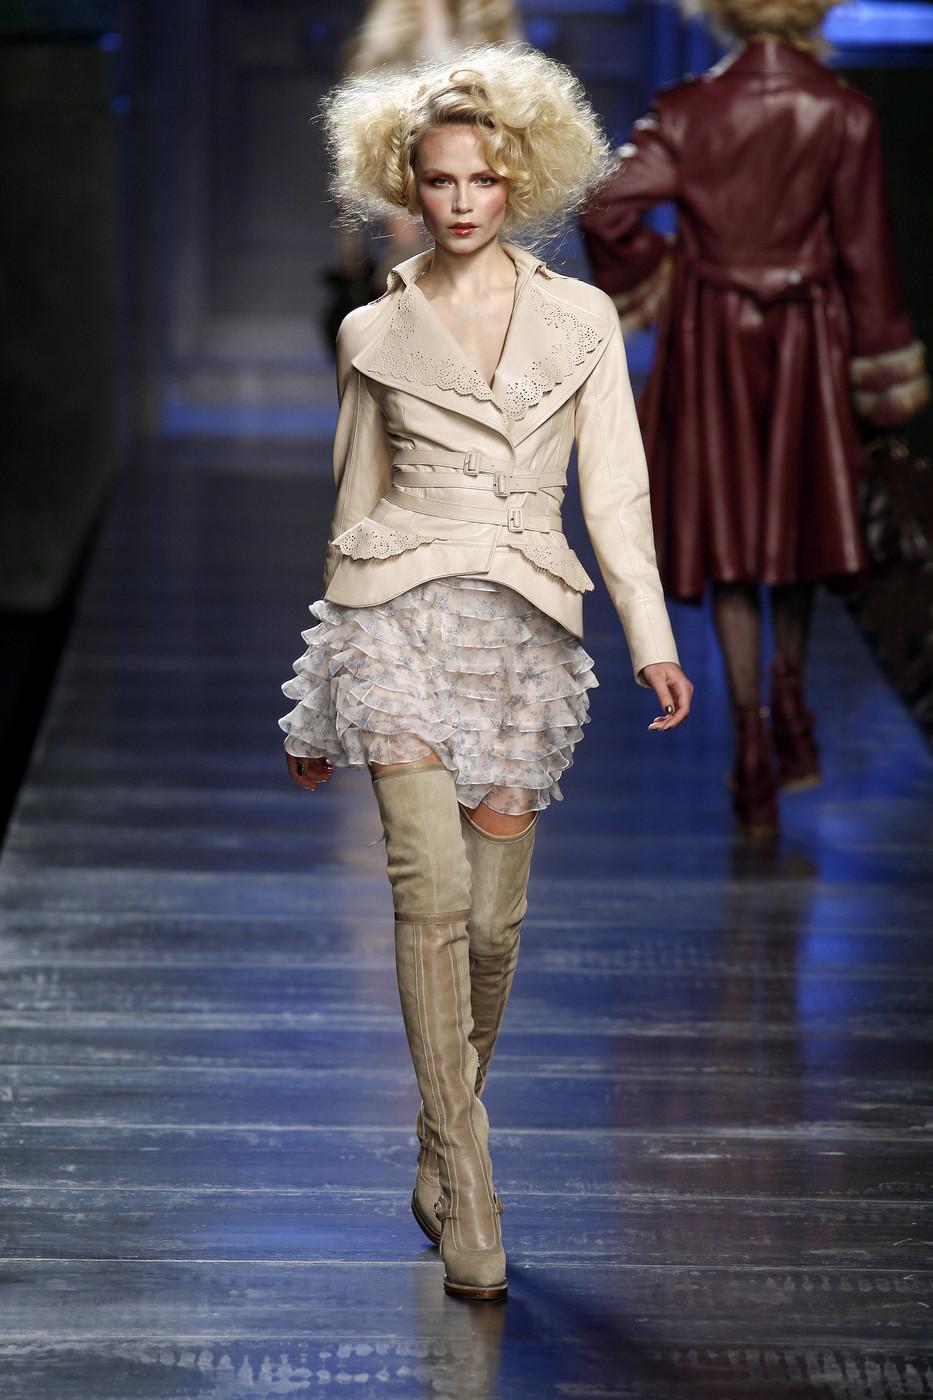 via fashioned by love | John Galliano Christian Dior RTW Fall 2010